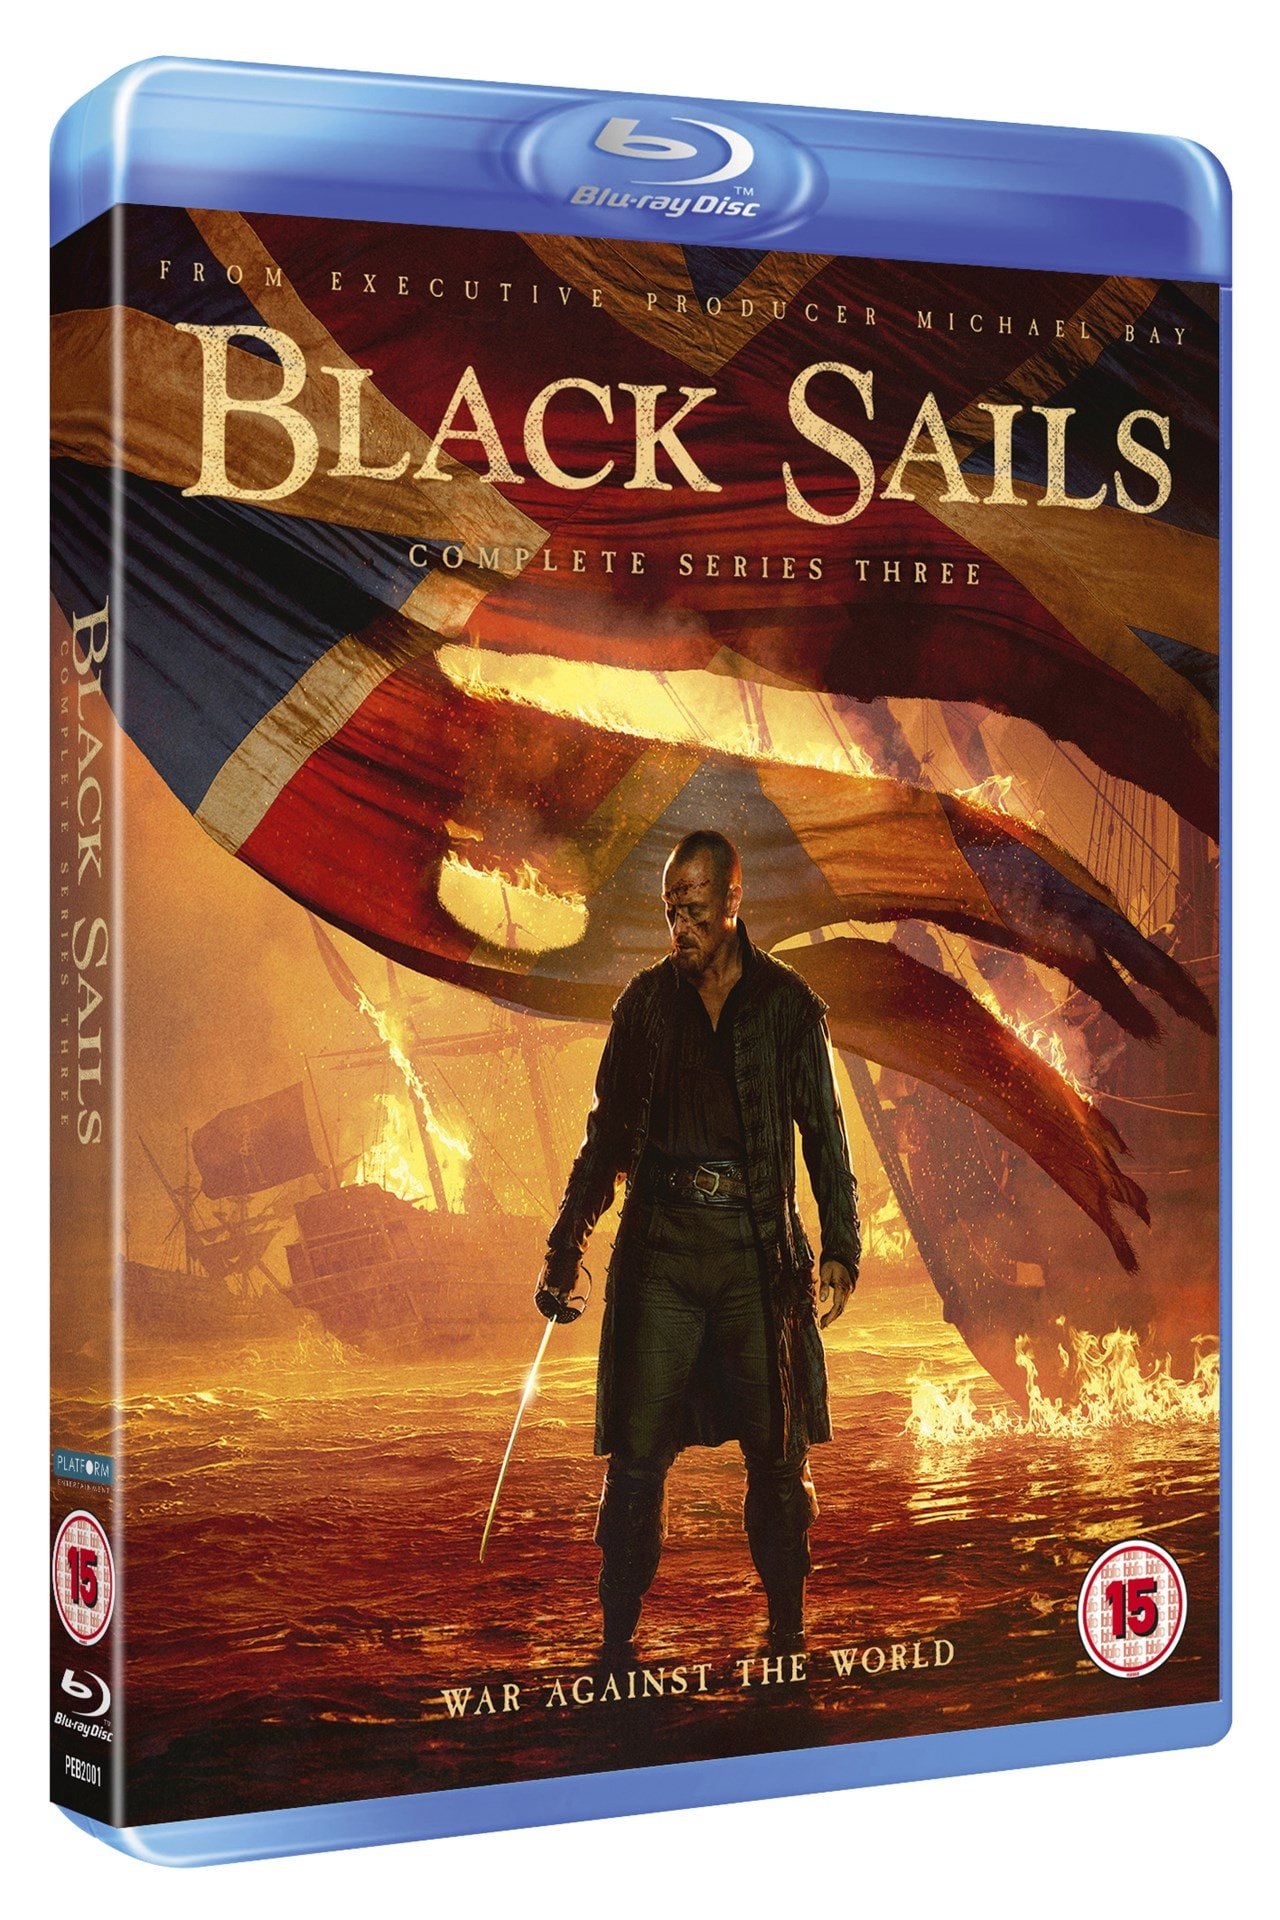 Black Sails: Complete Series Three - 2